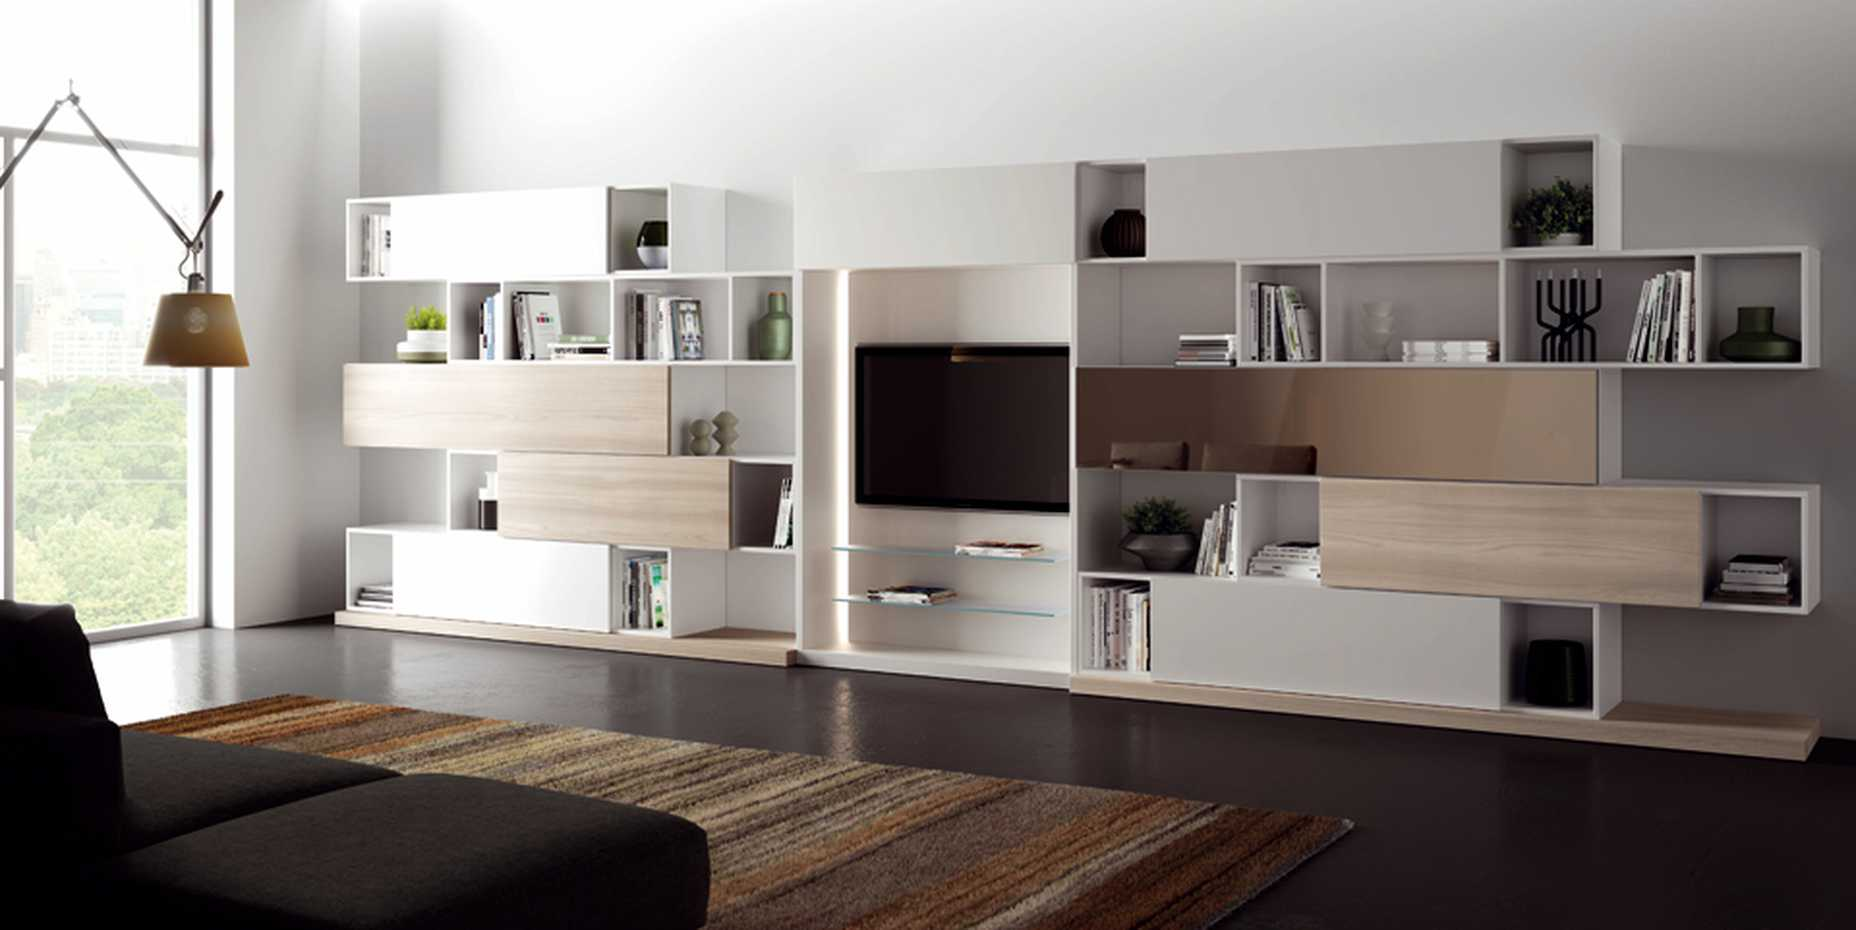 Nestos by Mercantini product image 6